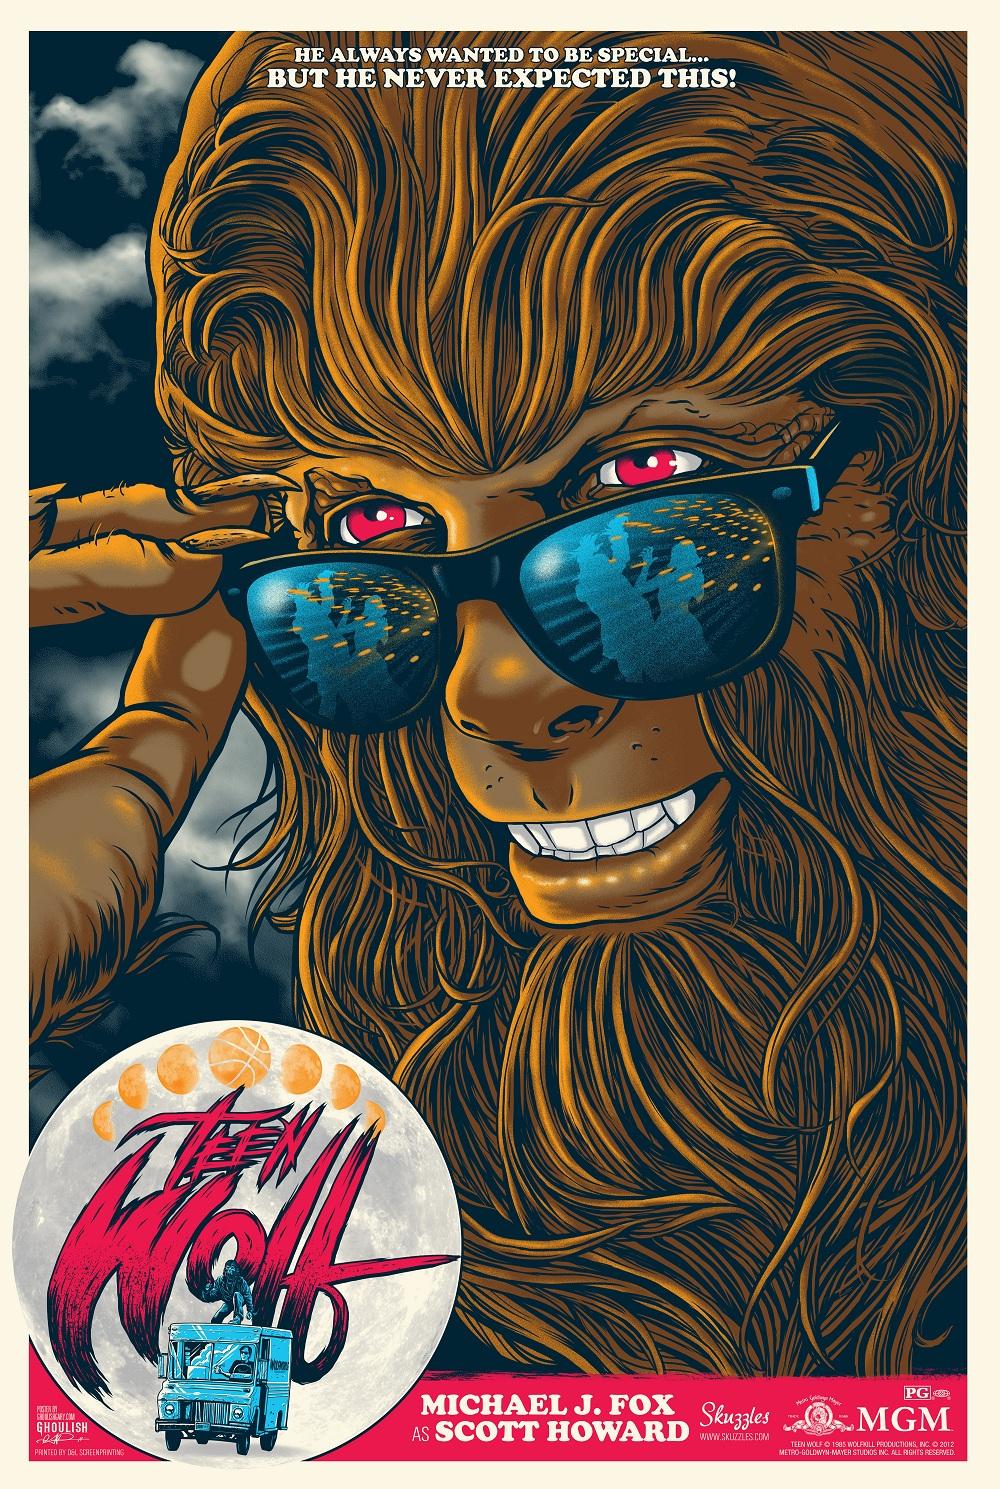 Ghoulish Gary Pullin teen wolf